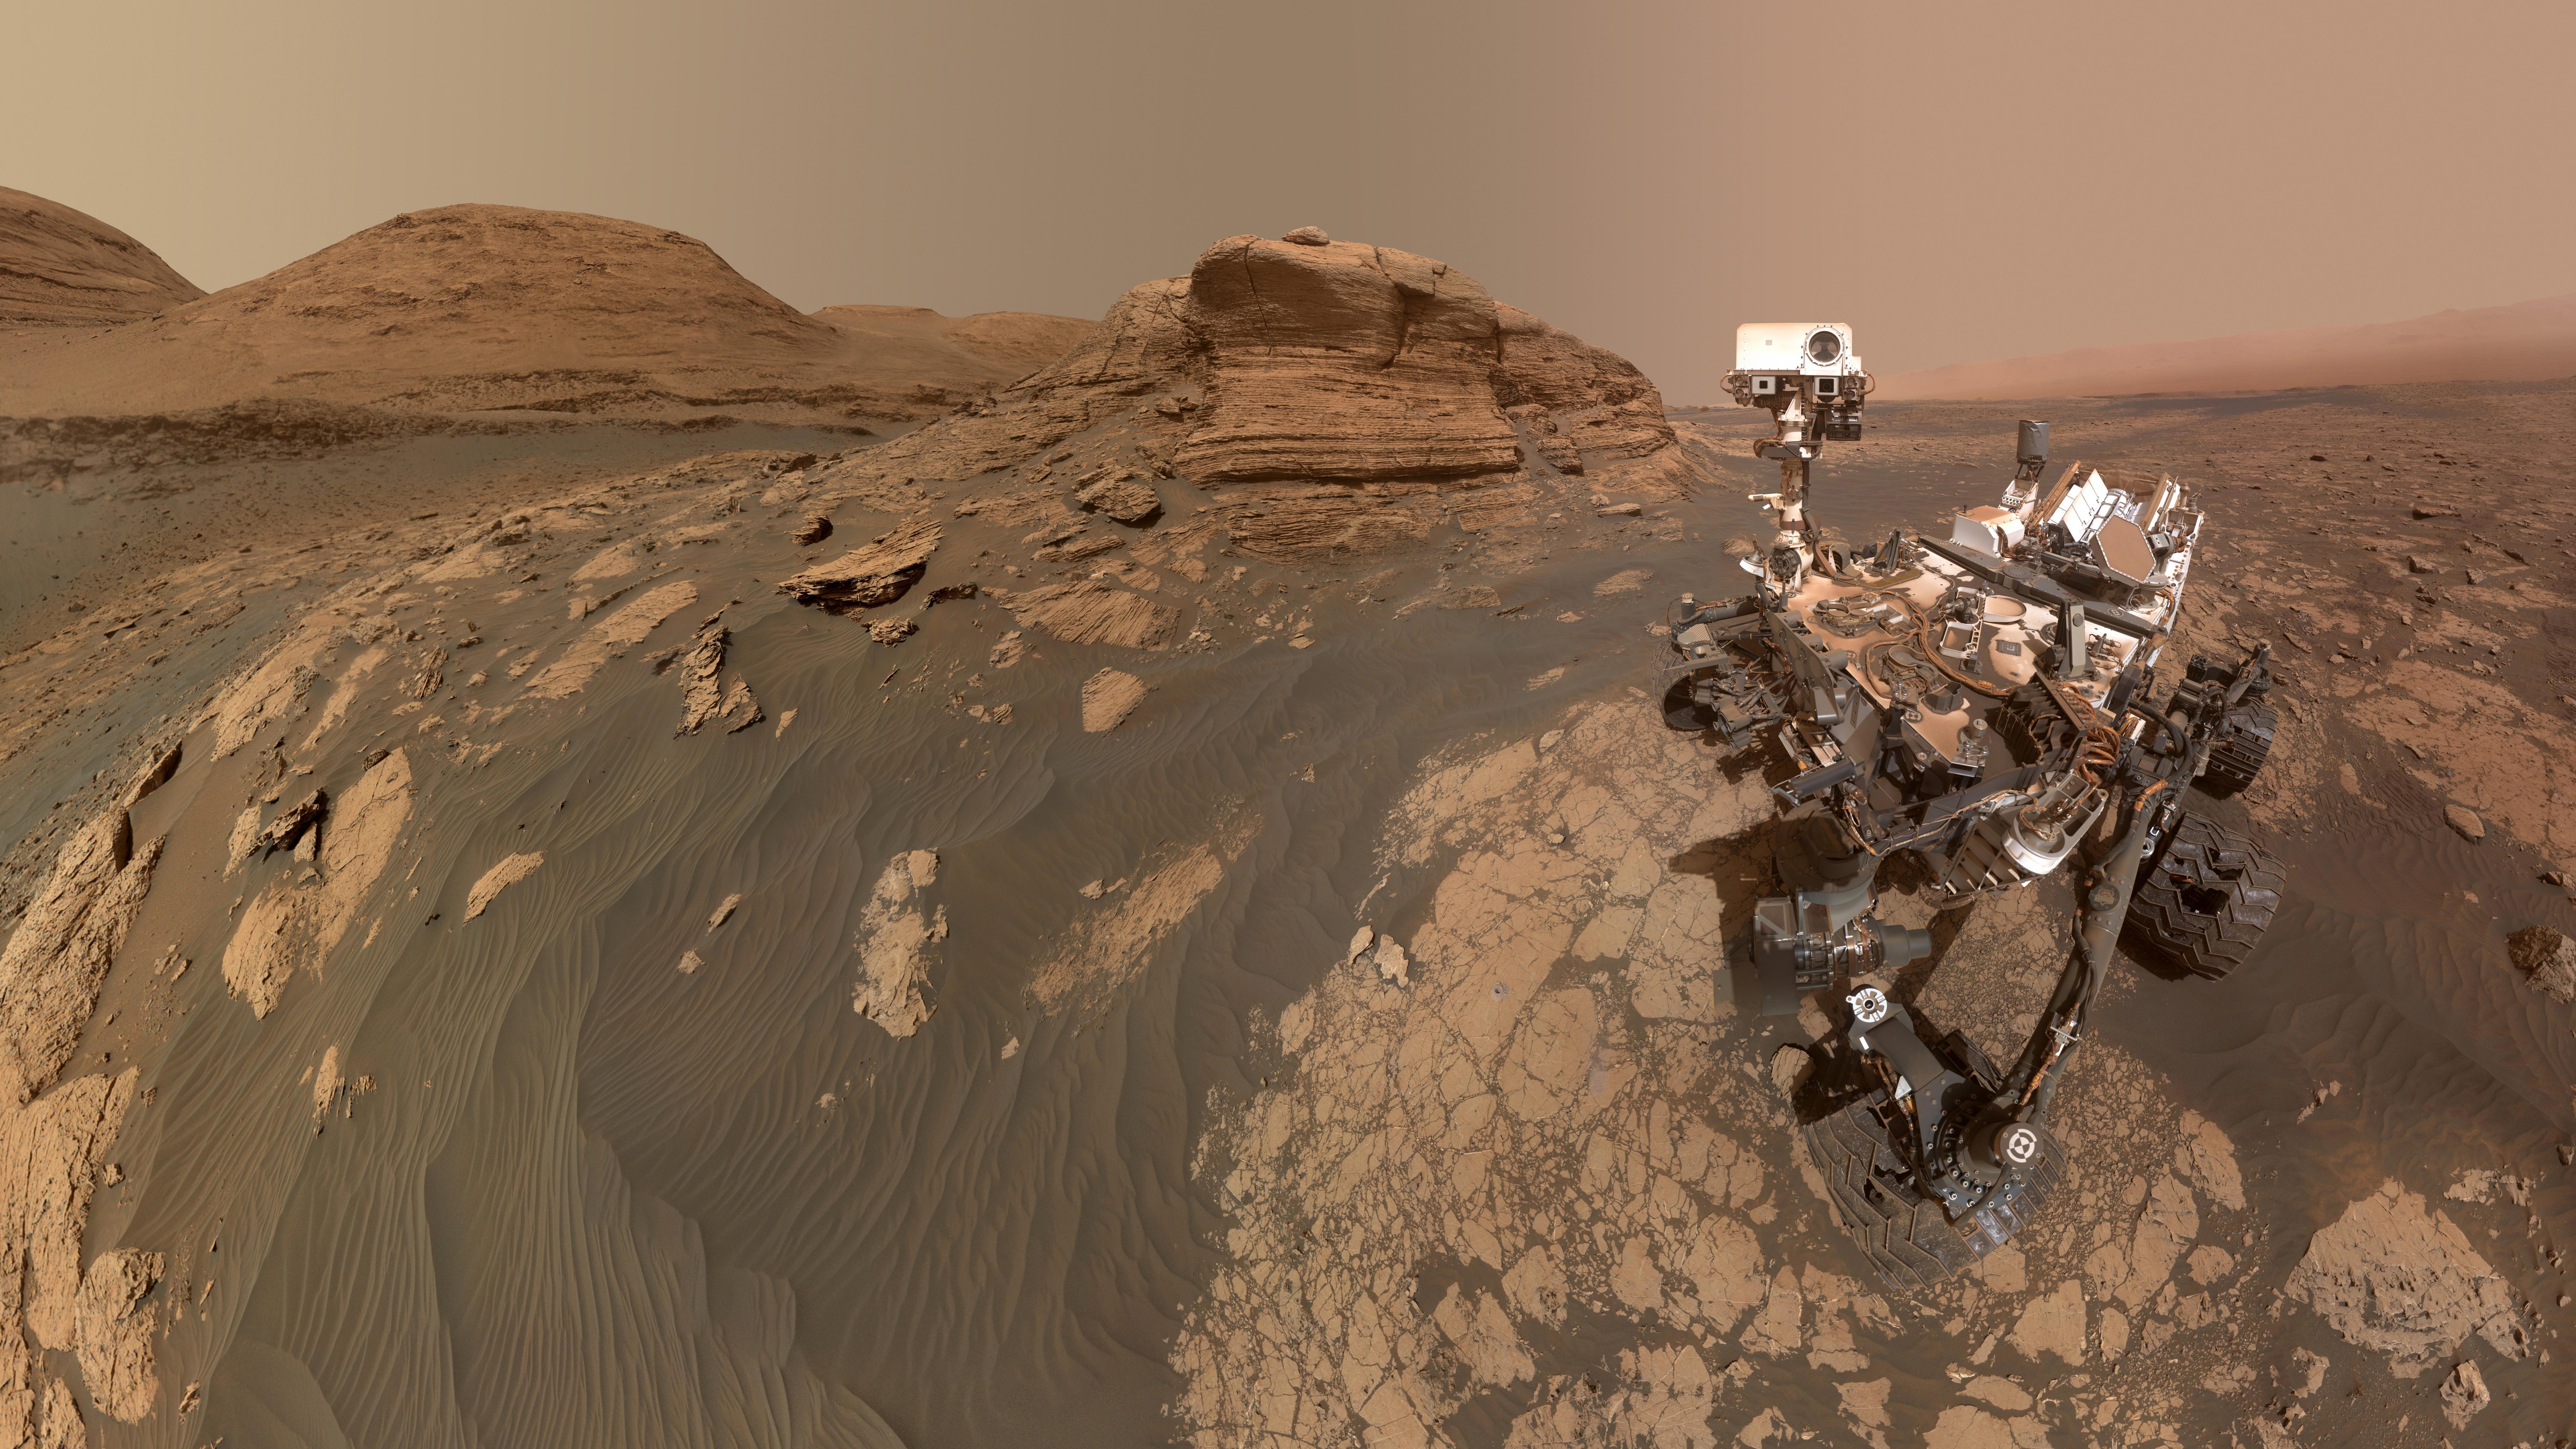 Blood, sweat and tears: жильё на Марсе из подручных материалов